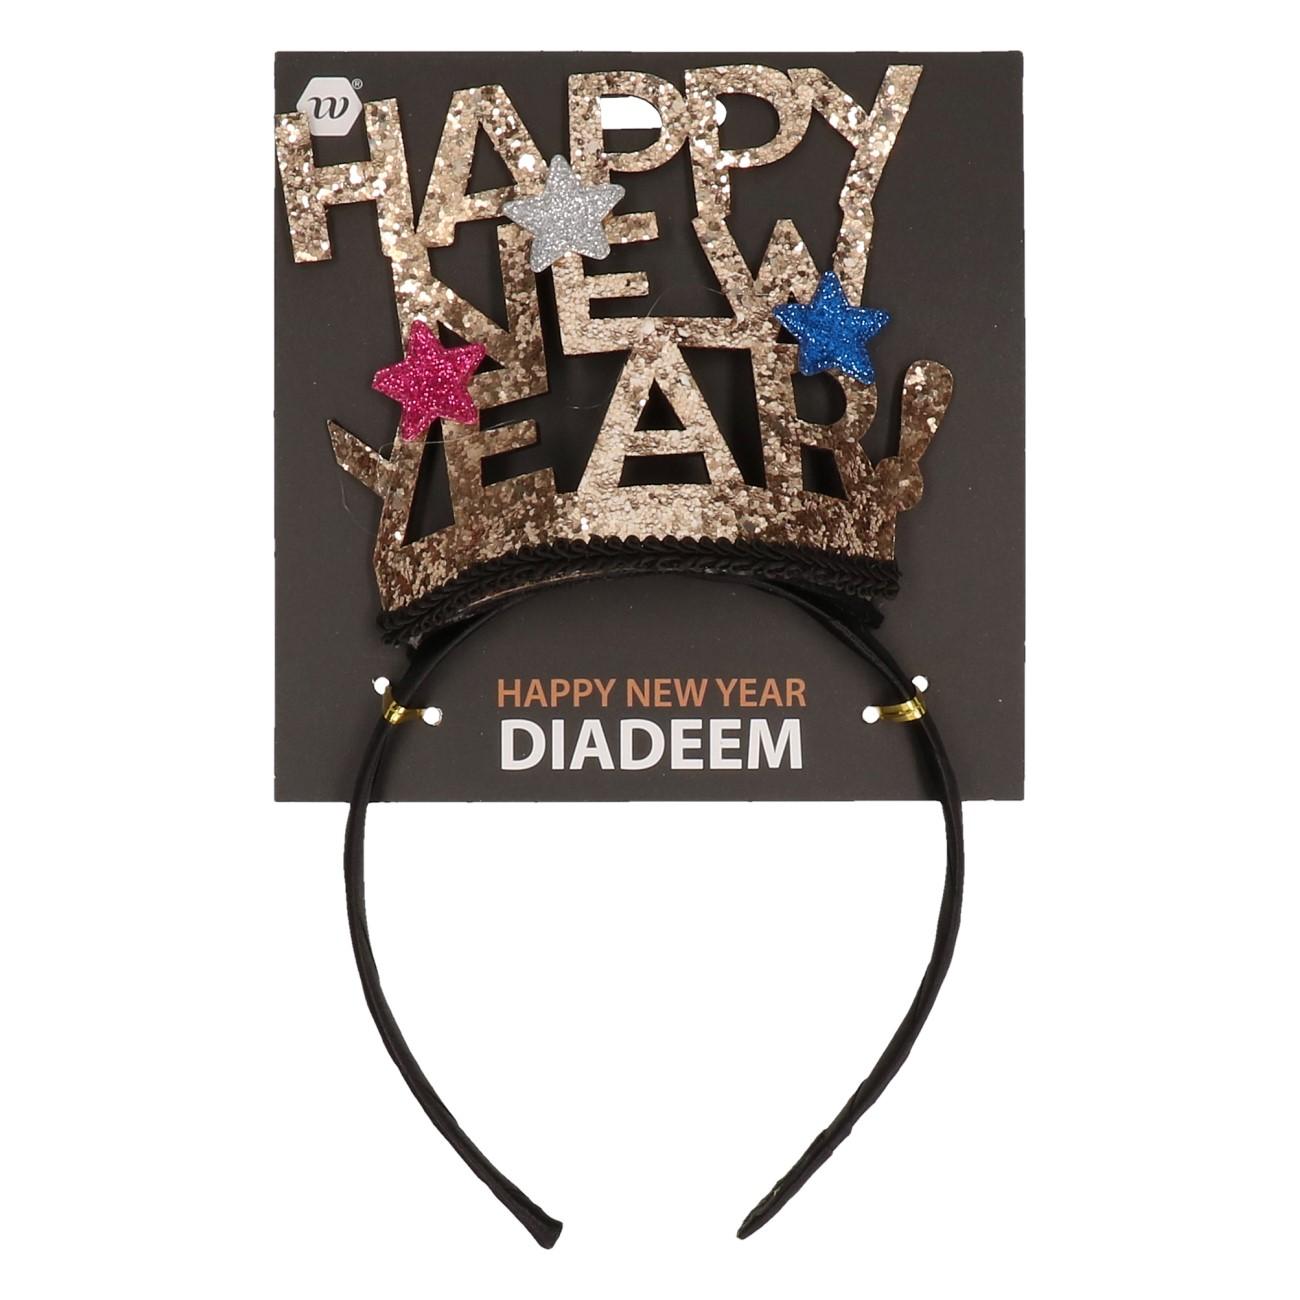 Diadeem happy new year